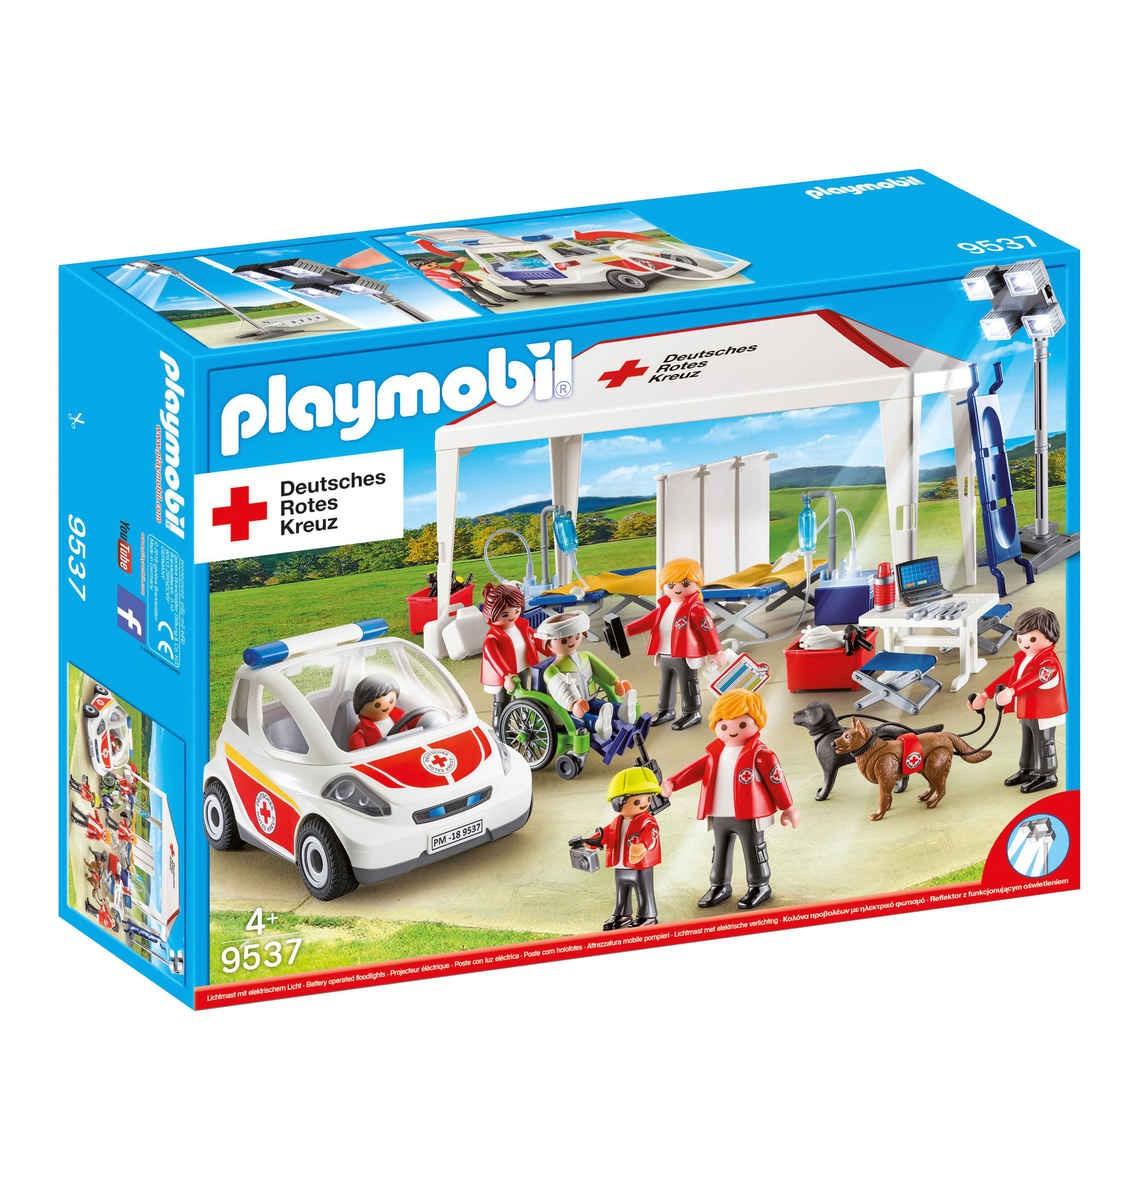 PLAYMOBIL® Deutsches Rotes Kreuz 9537 [16,99€ Abholung]